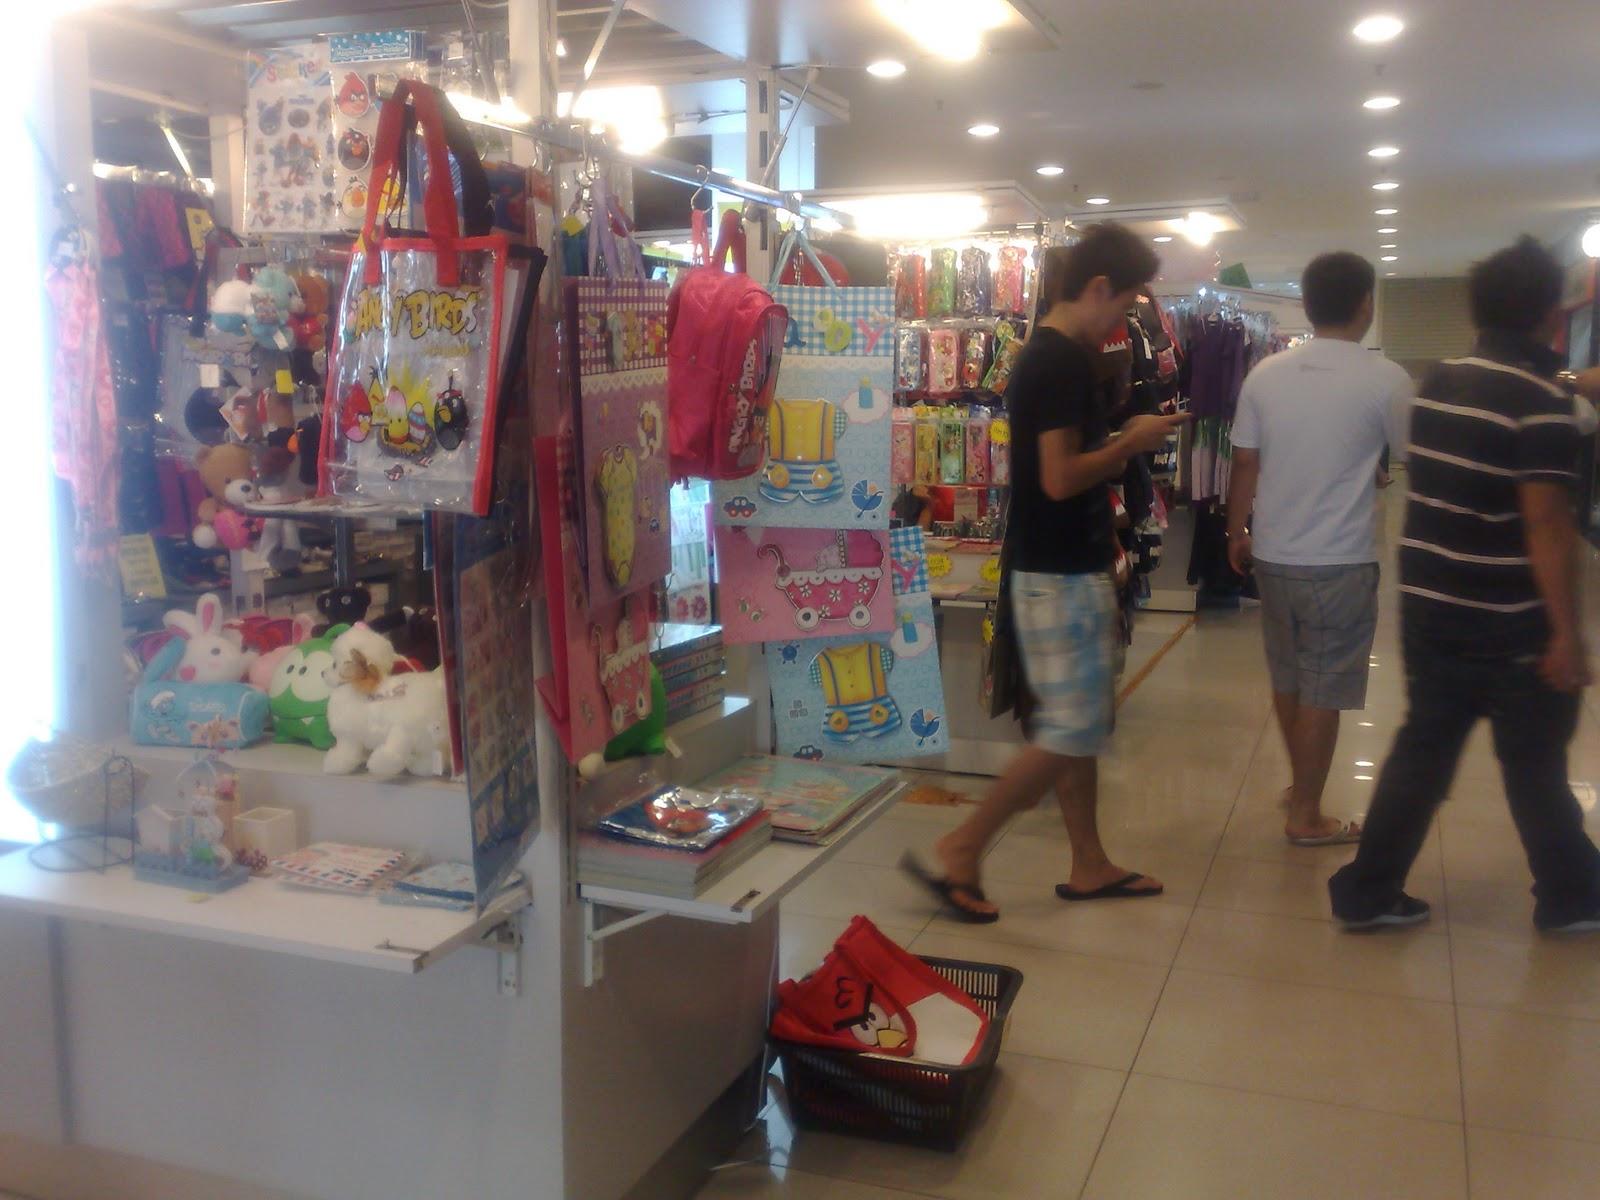 Melayu awek bp mall - 3 part 7